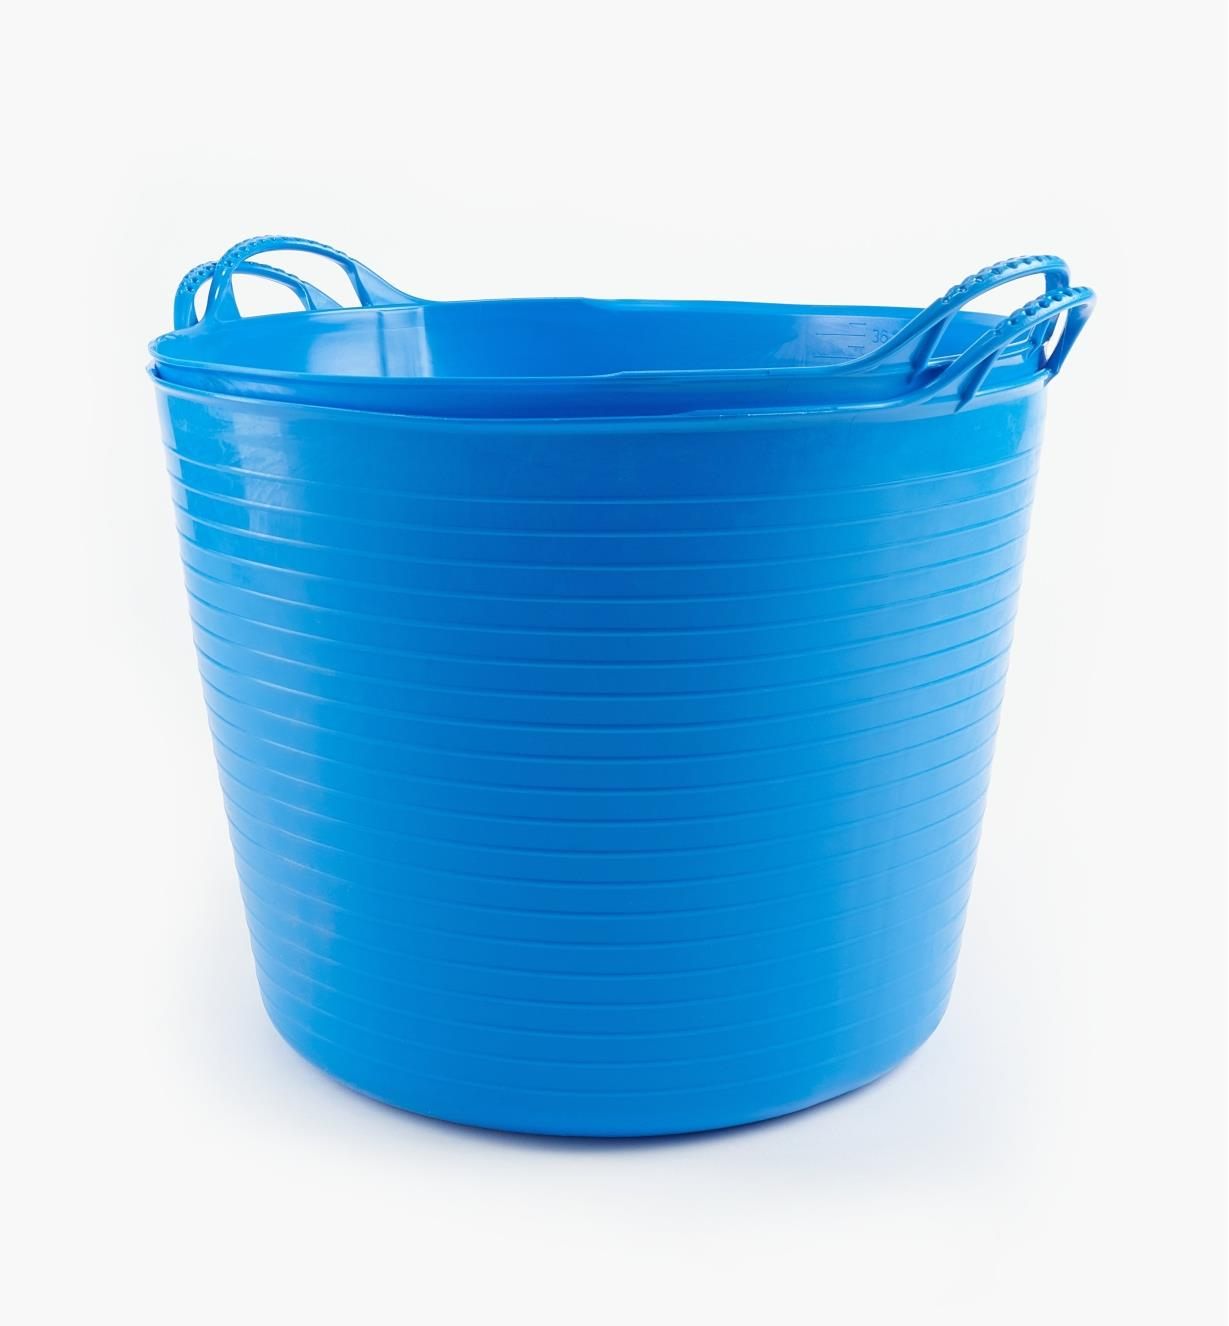 WT645 - 38l Blue Tubs, pair